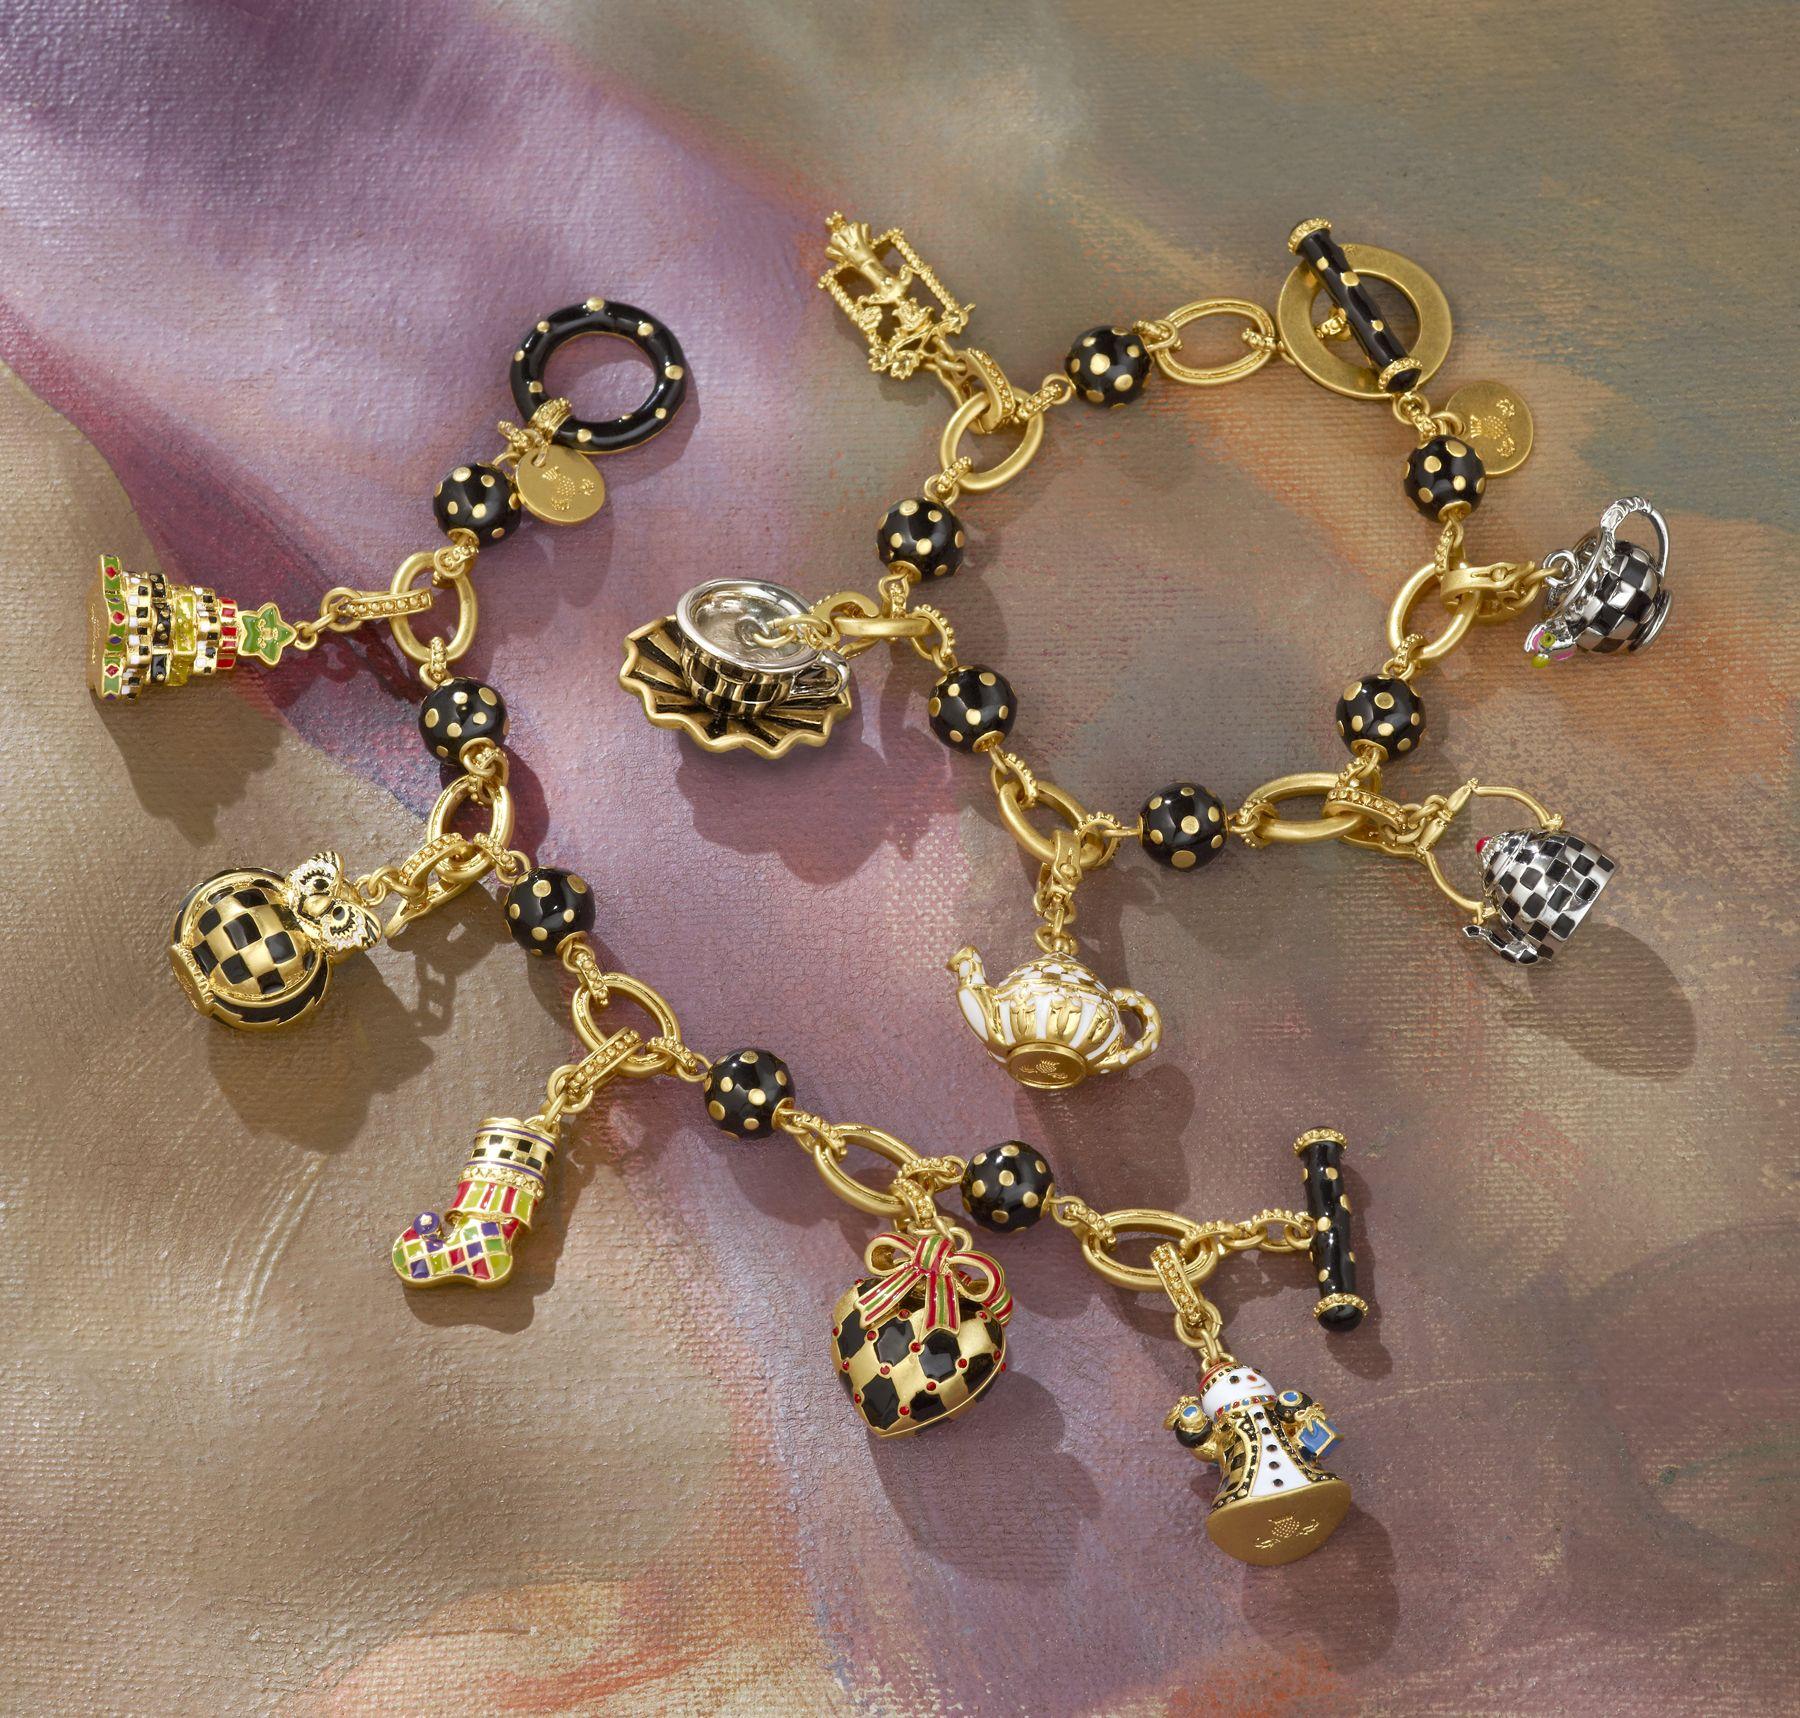 Make your own sentimental charm bracelet using trinkets you find